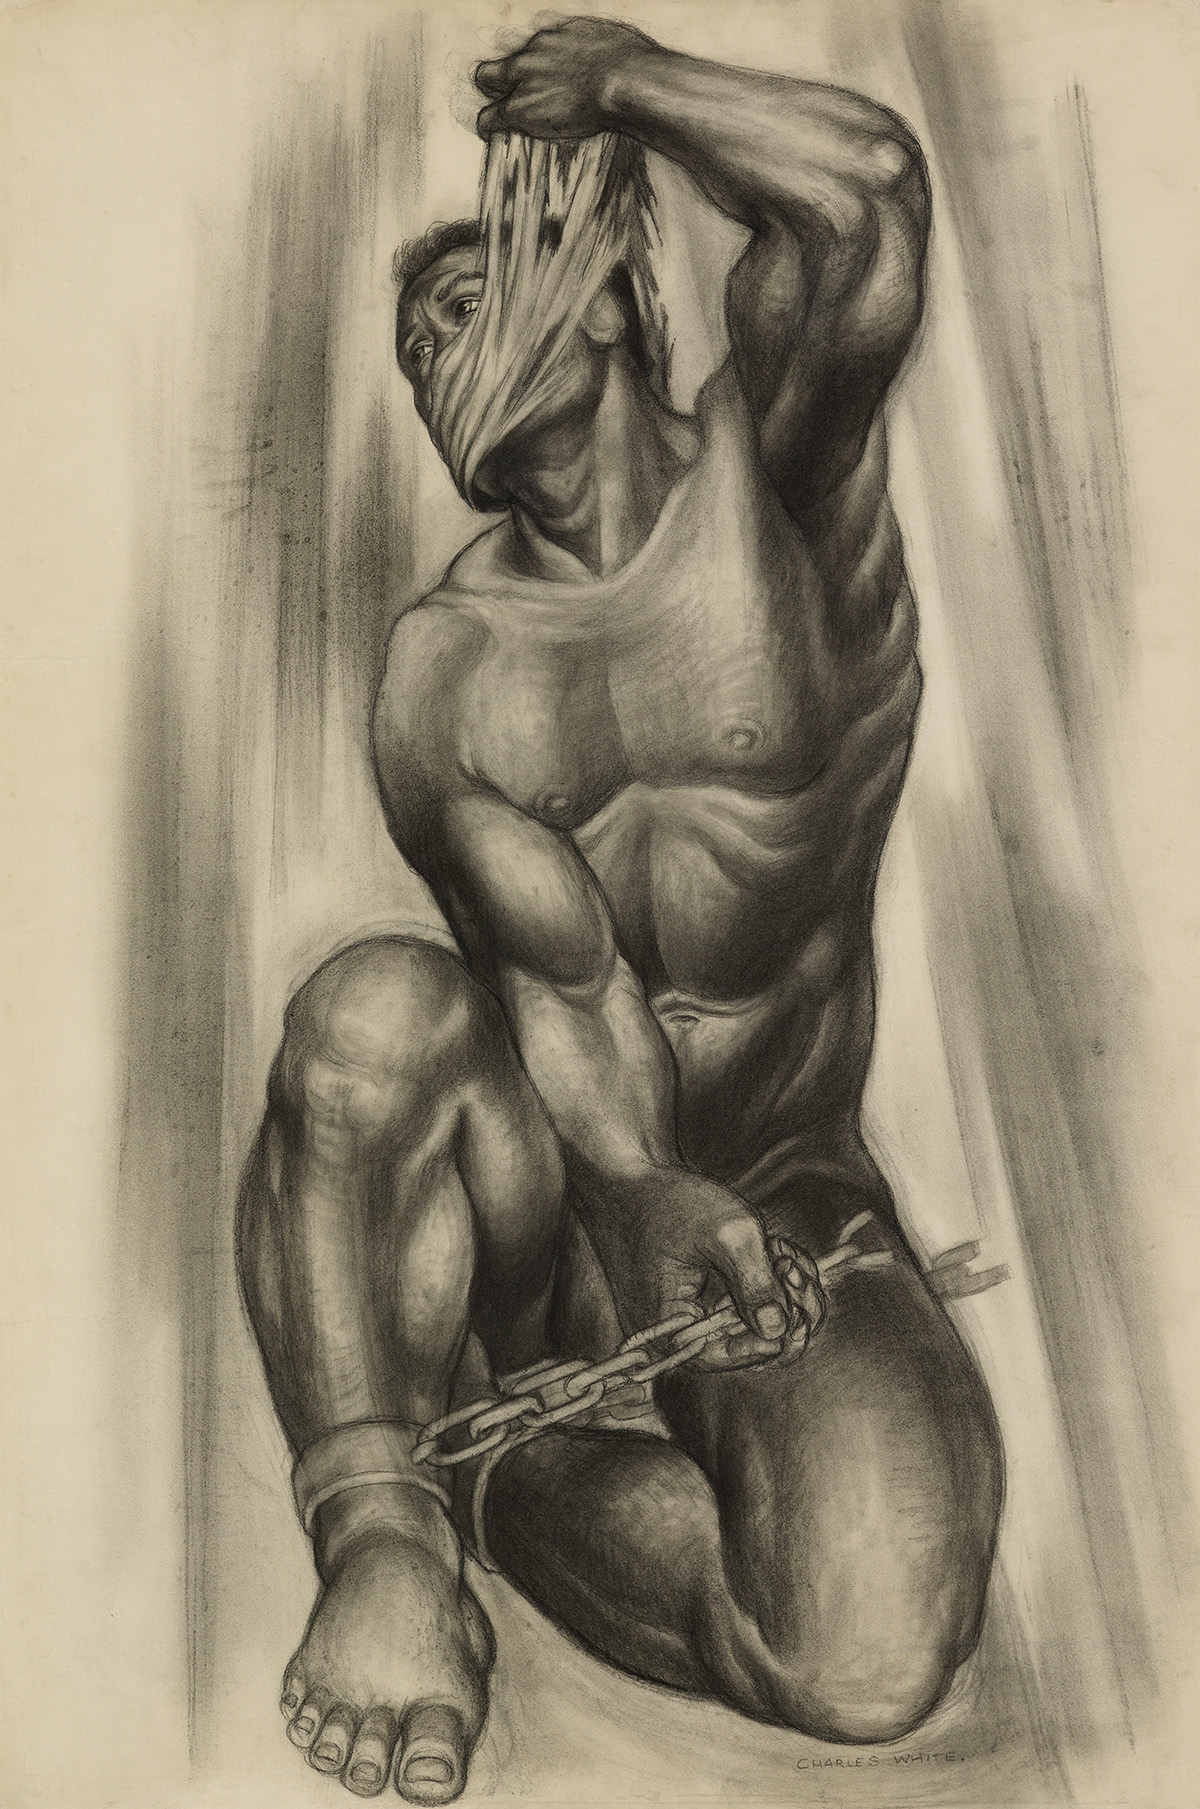 CHARLES WHITE (1918 - 1979) Caliban.